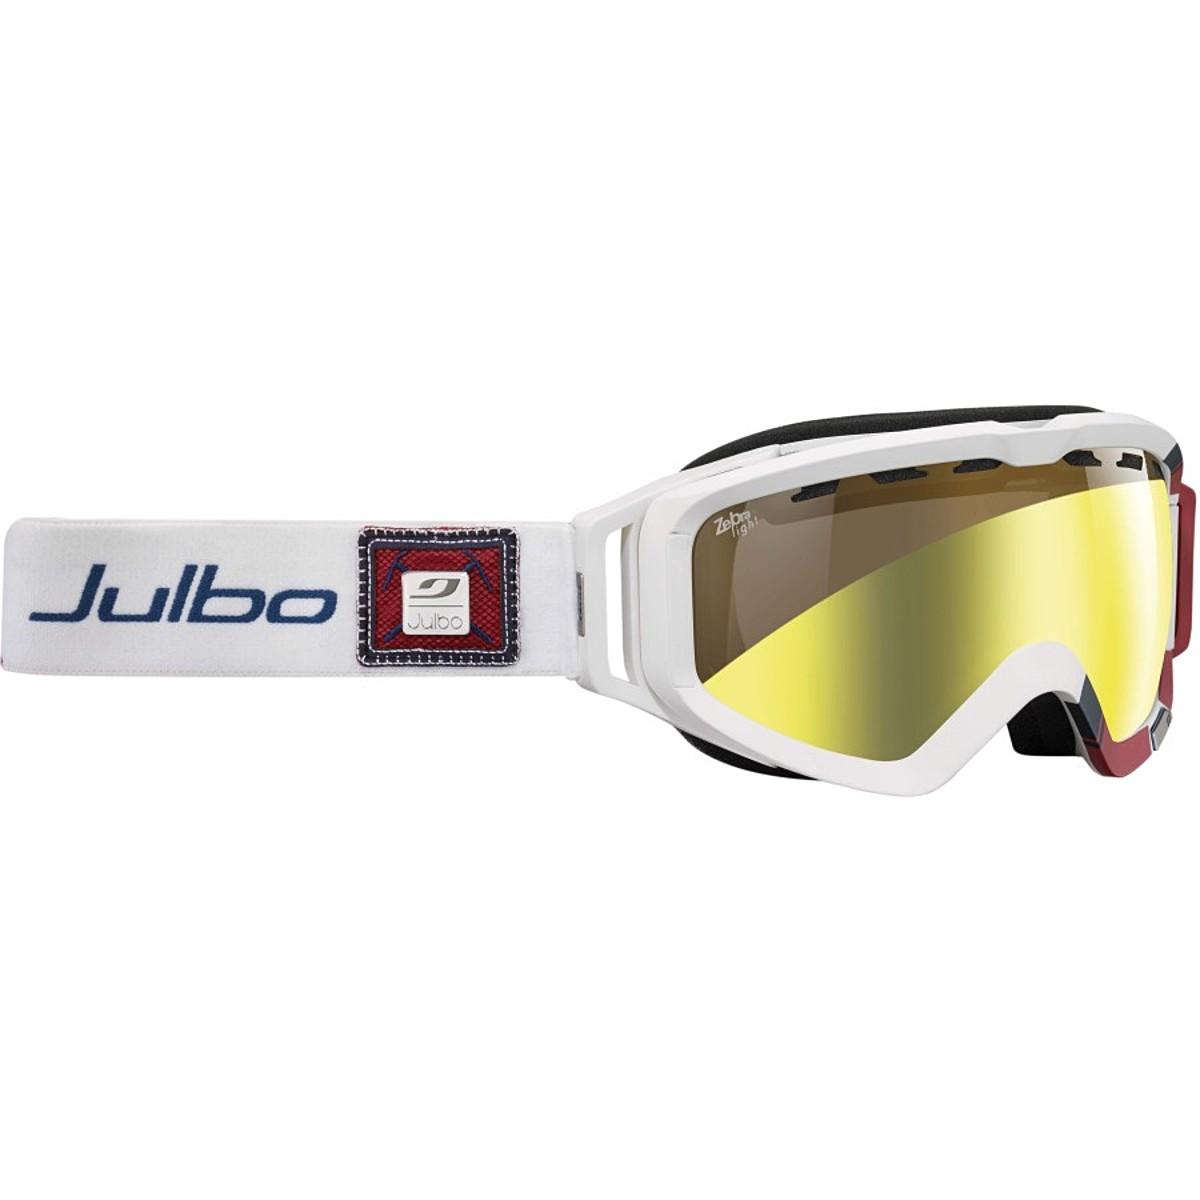 Julbo Orbiter Goggles